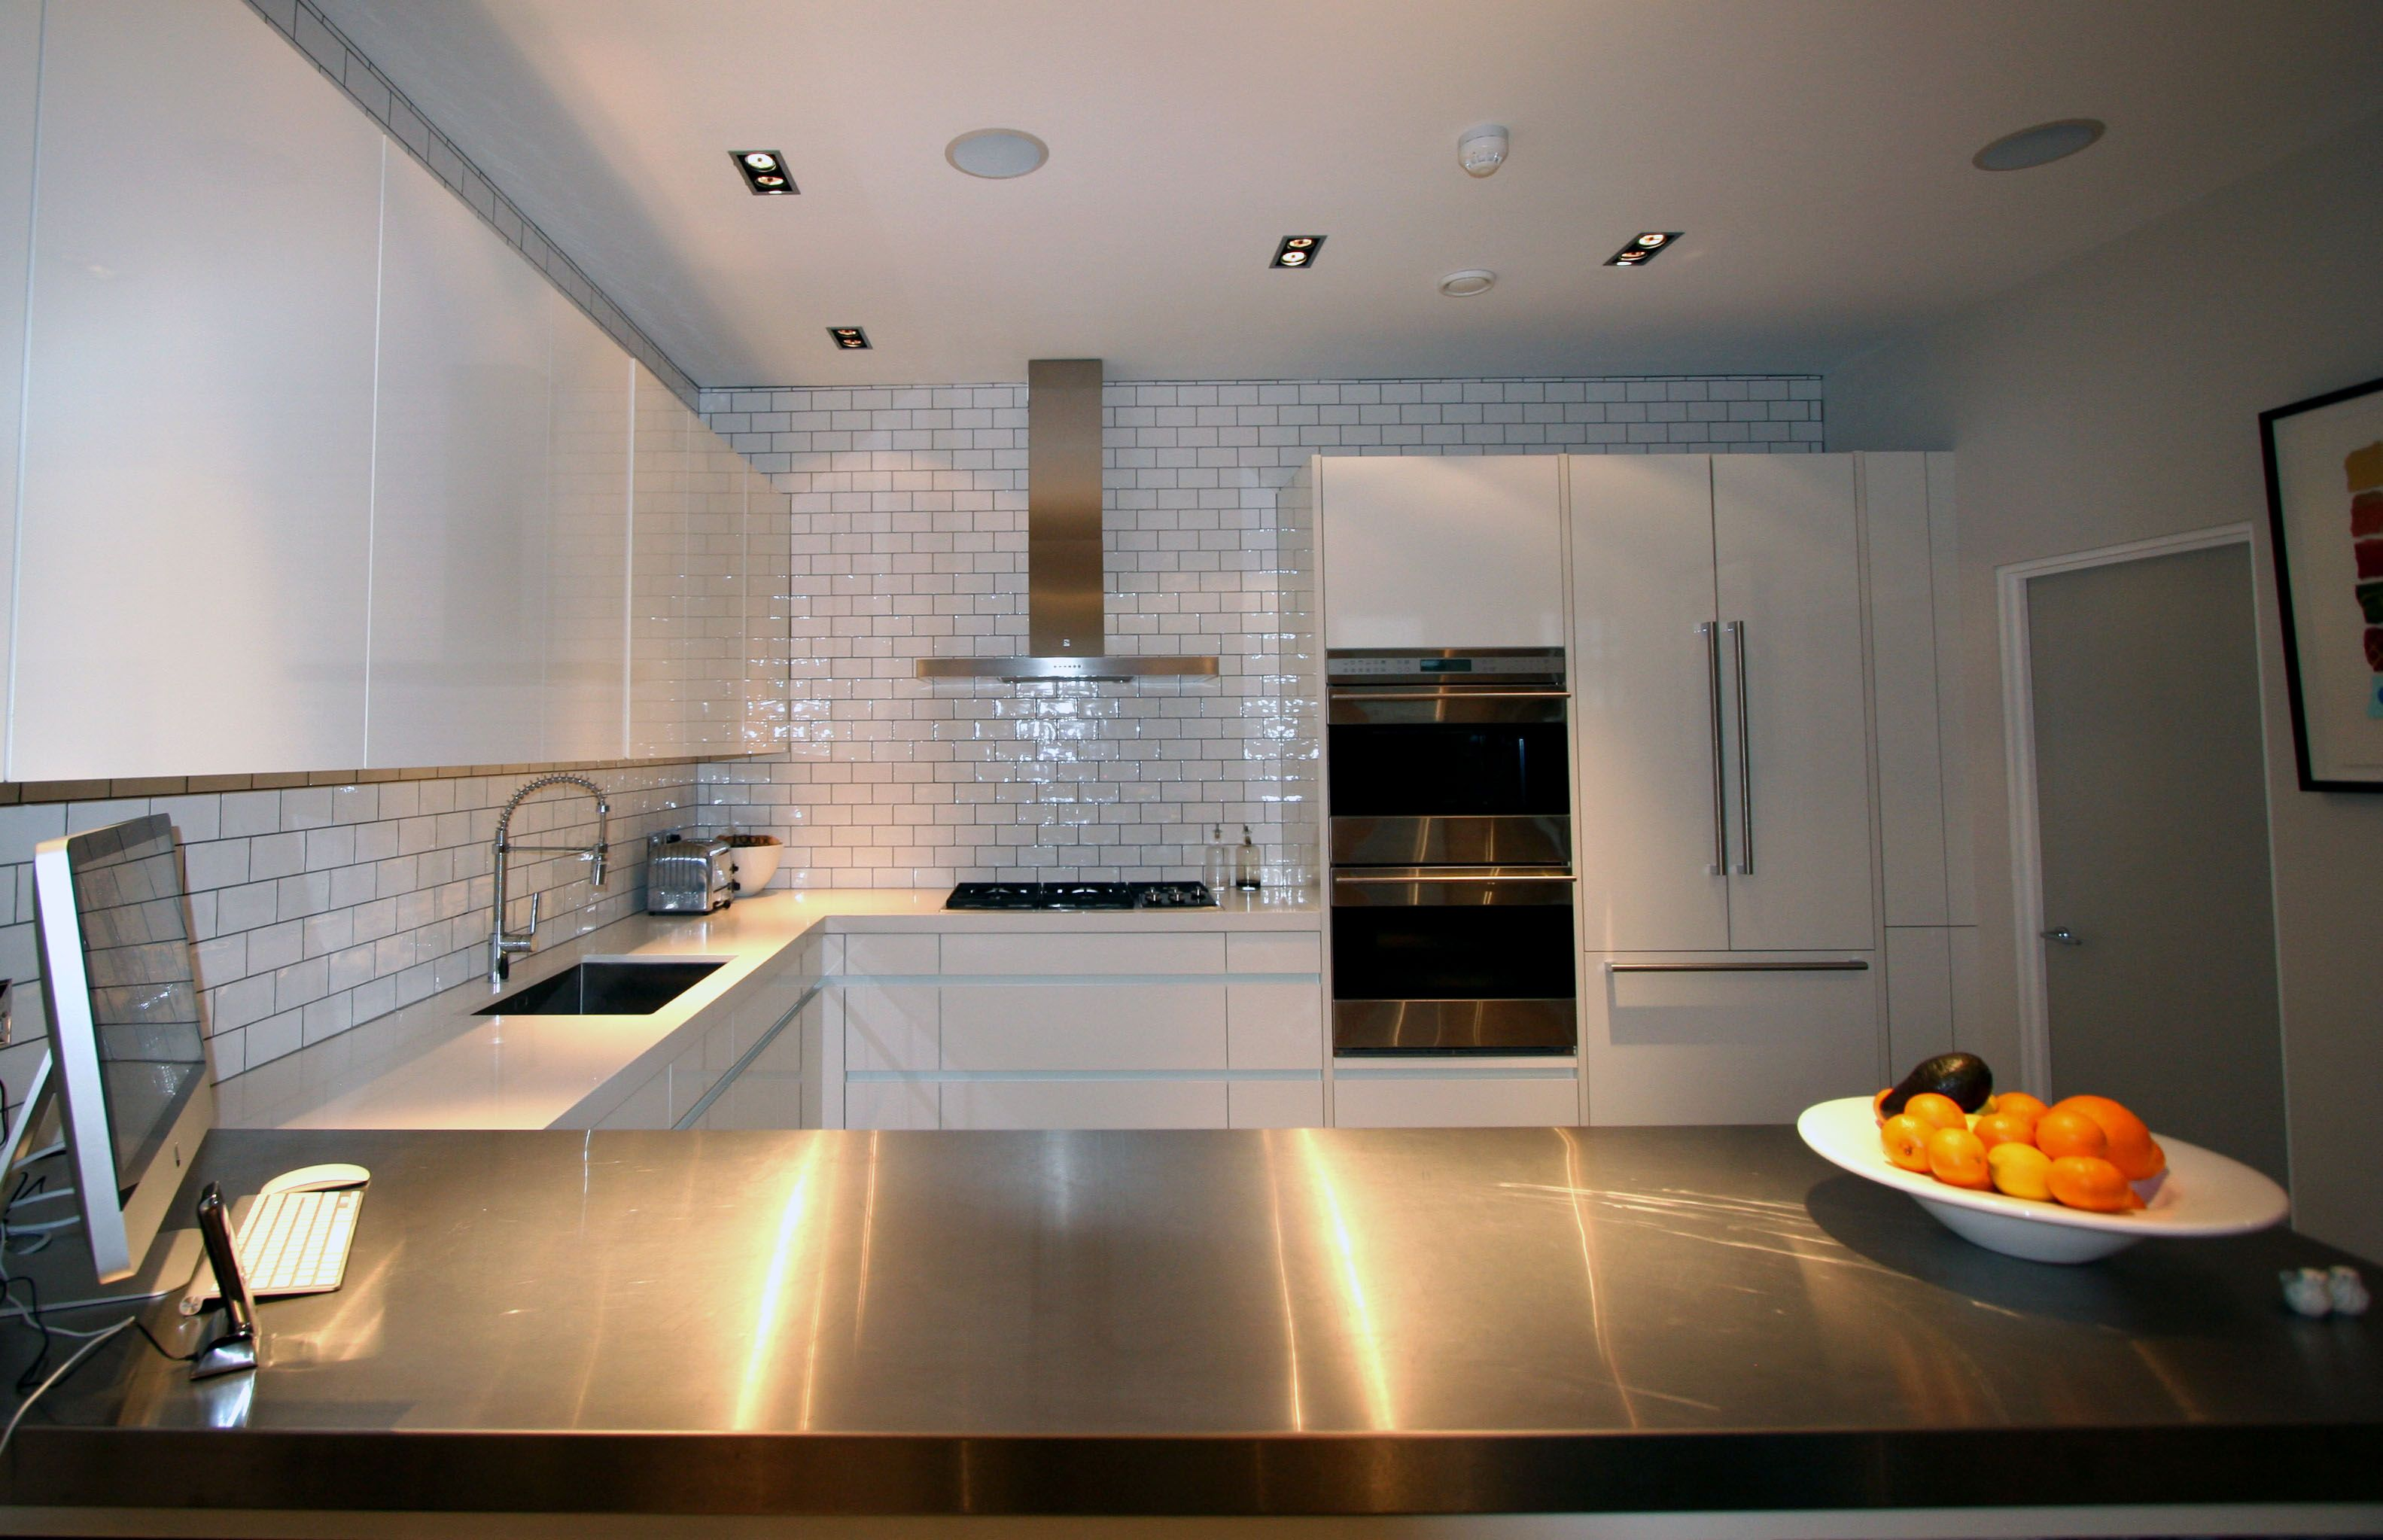 kitchen wall tile ideas Google Search Kitchen